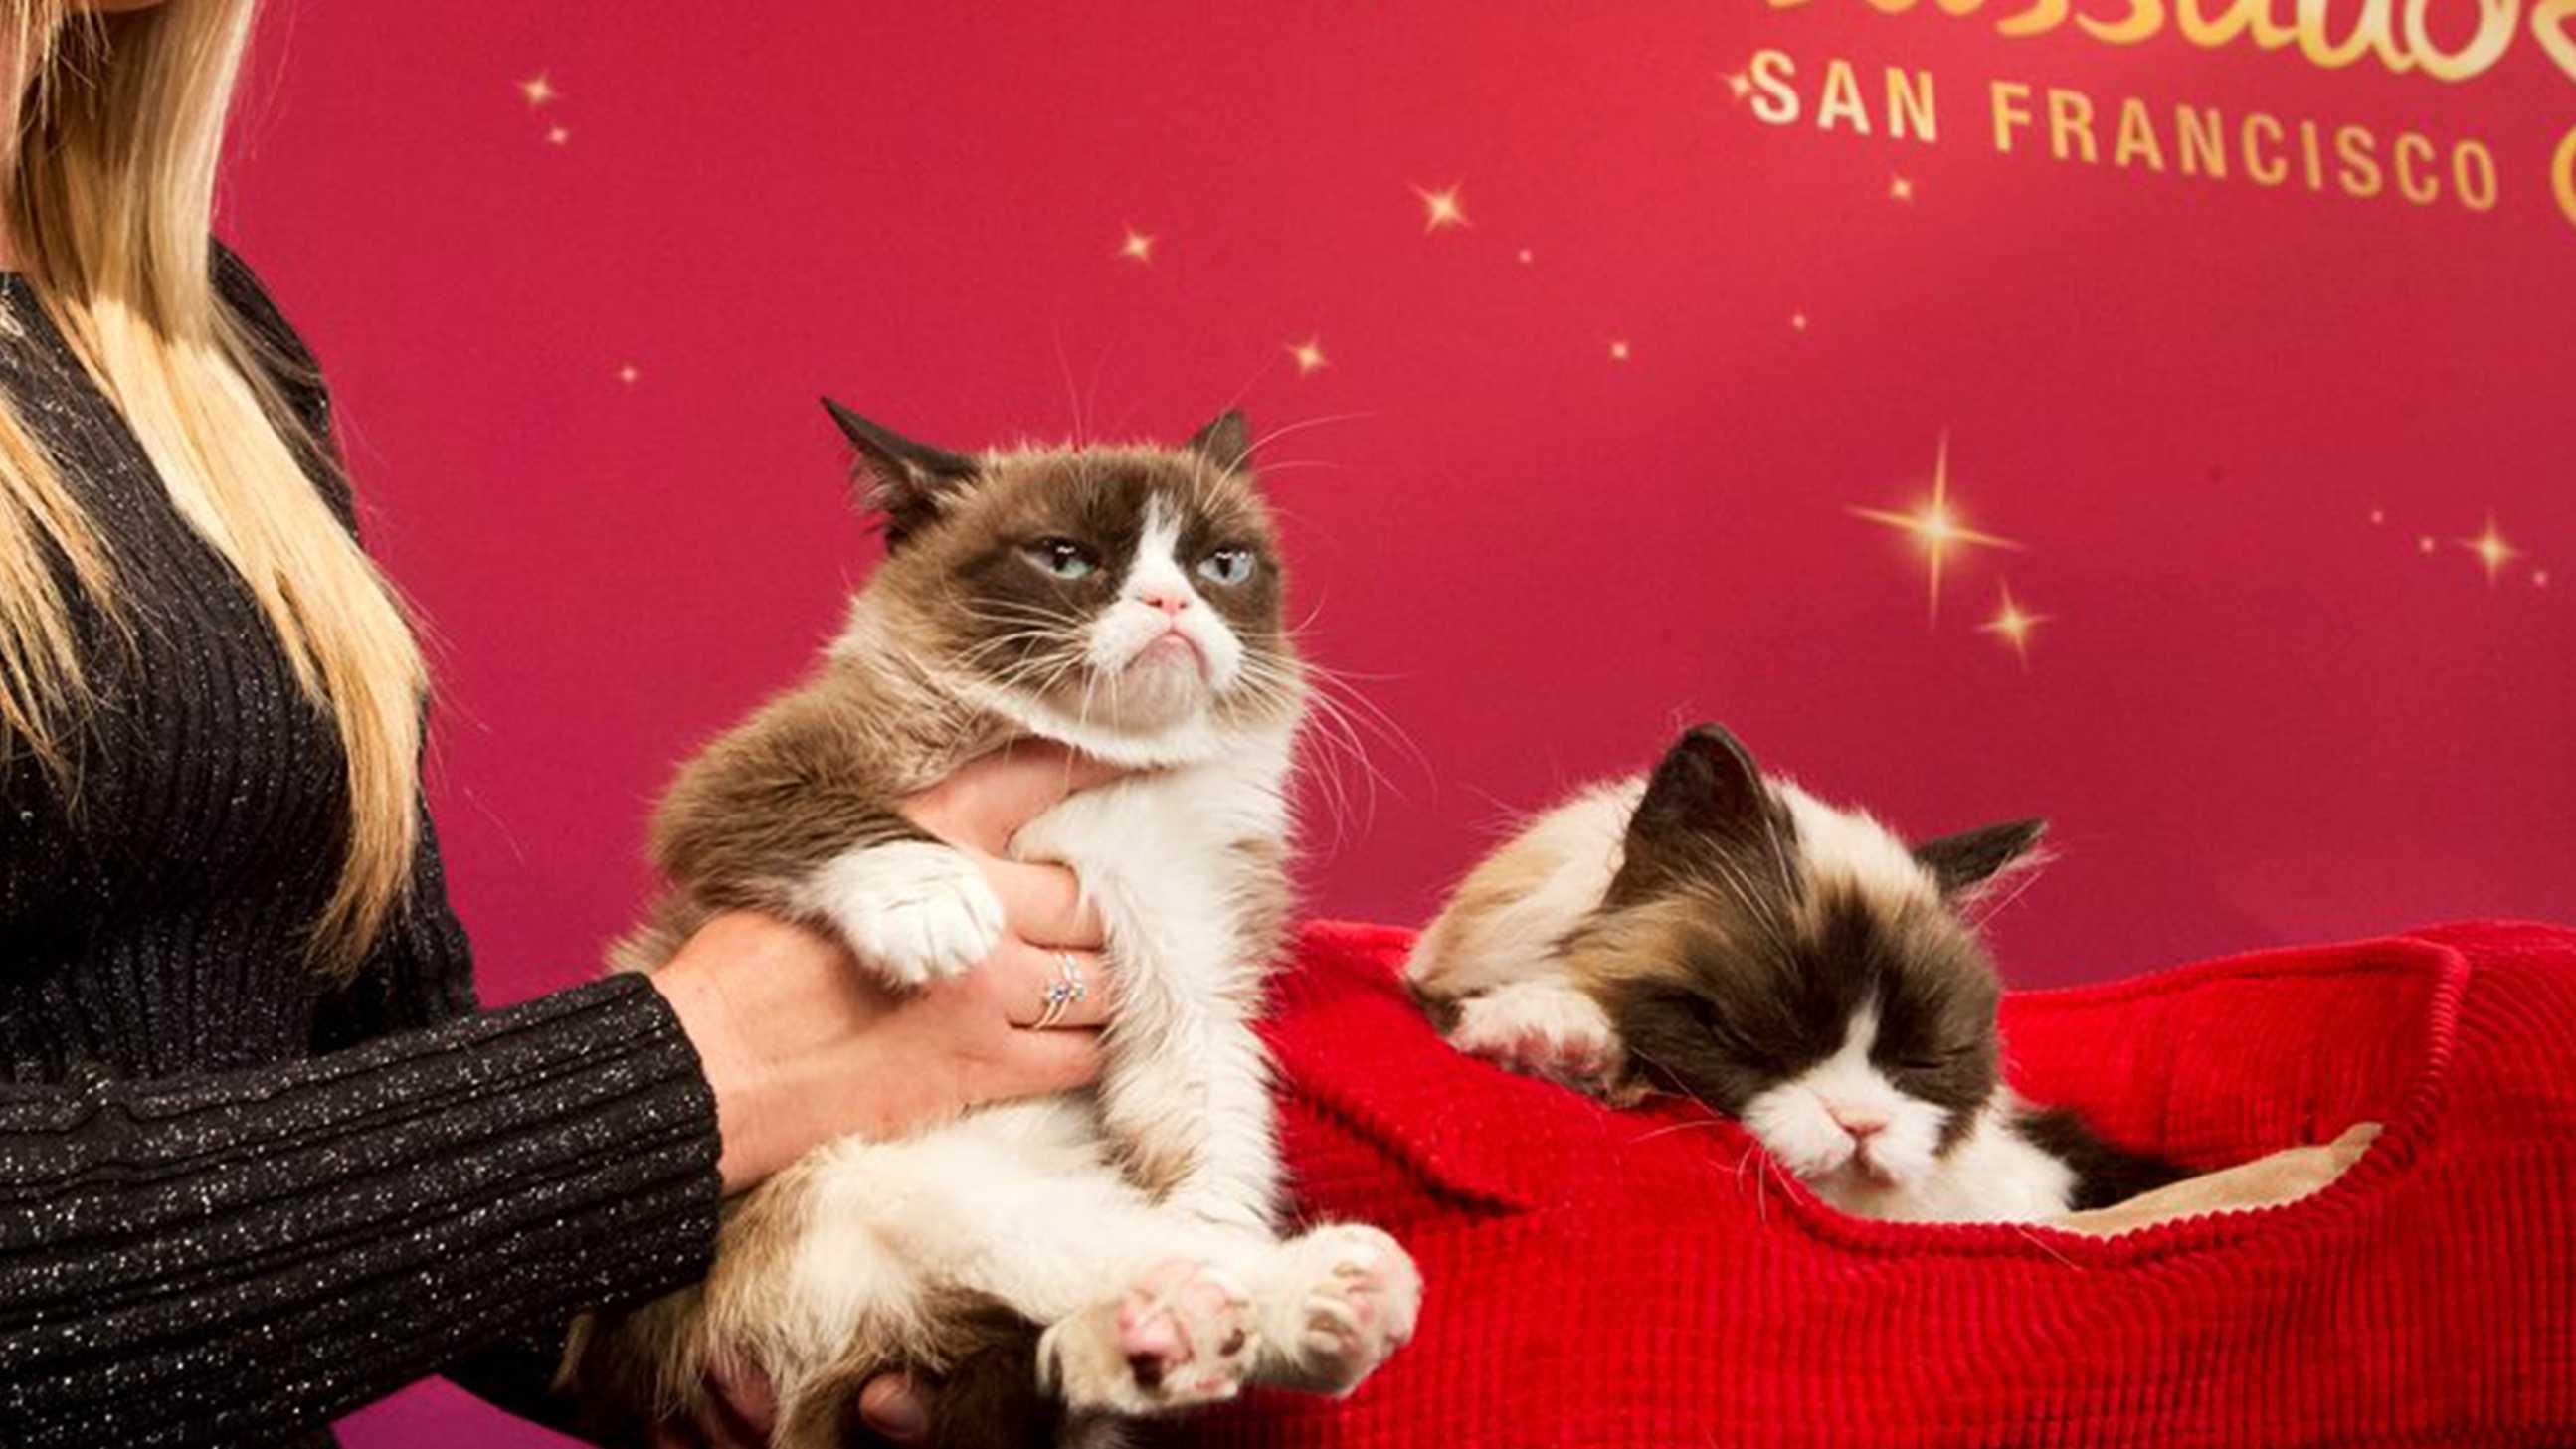 Grumpy Cat, left, poses next to an animatronic figure at Madame Tussauds San Francisco.